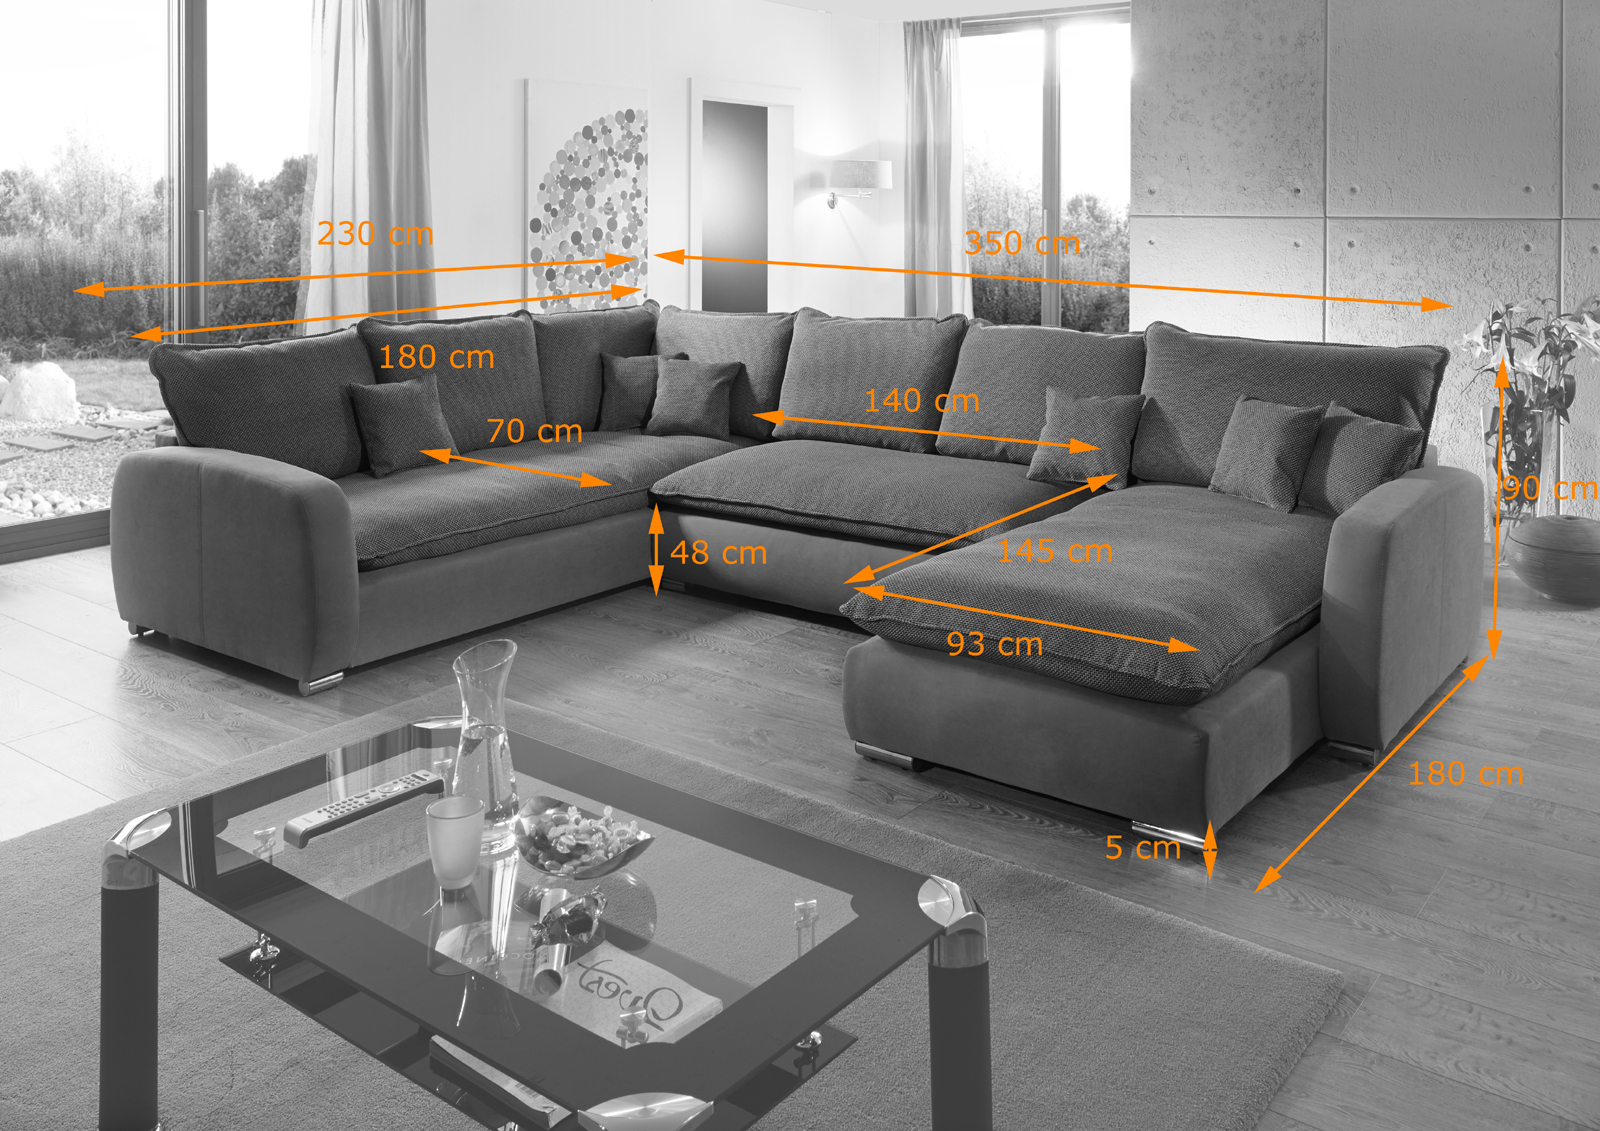 Graue Wohnlandschaft sam sofa grau wohnlandschaft scala 230 cm x 350 x 180 cm